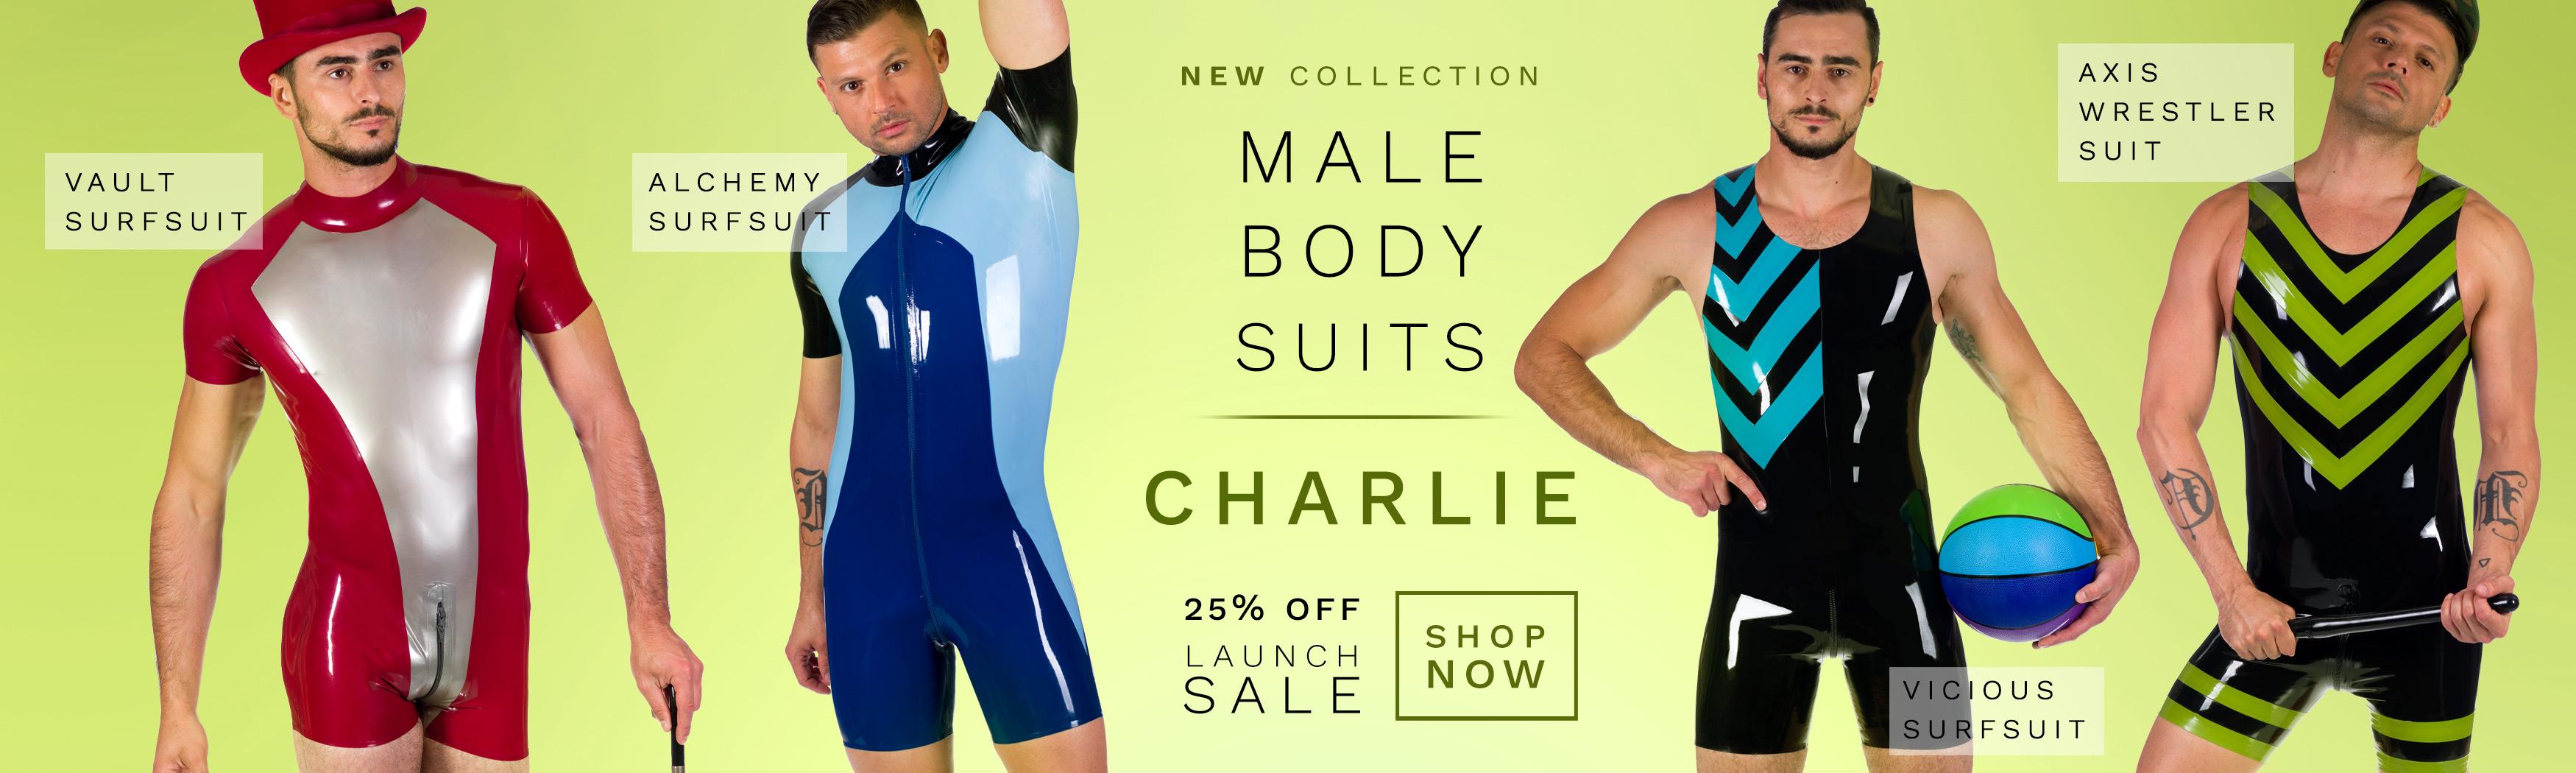 MALE BODYSUITS CHARLIE